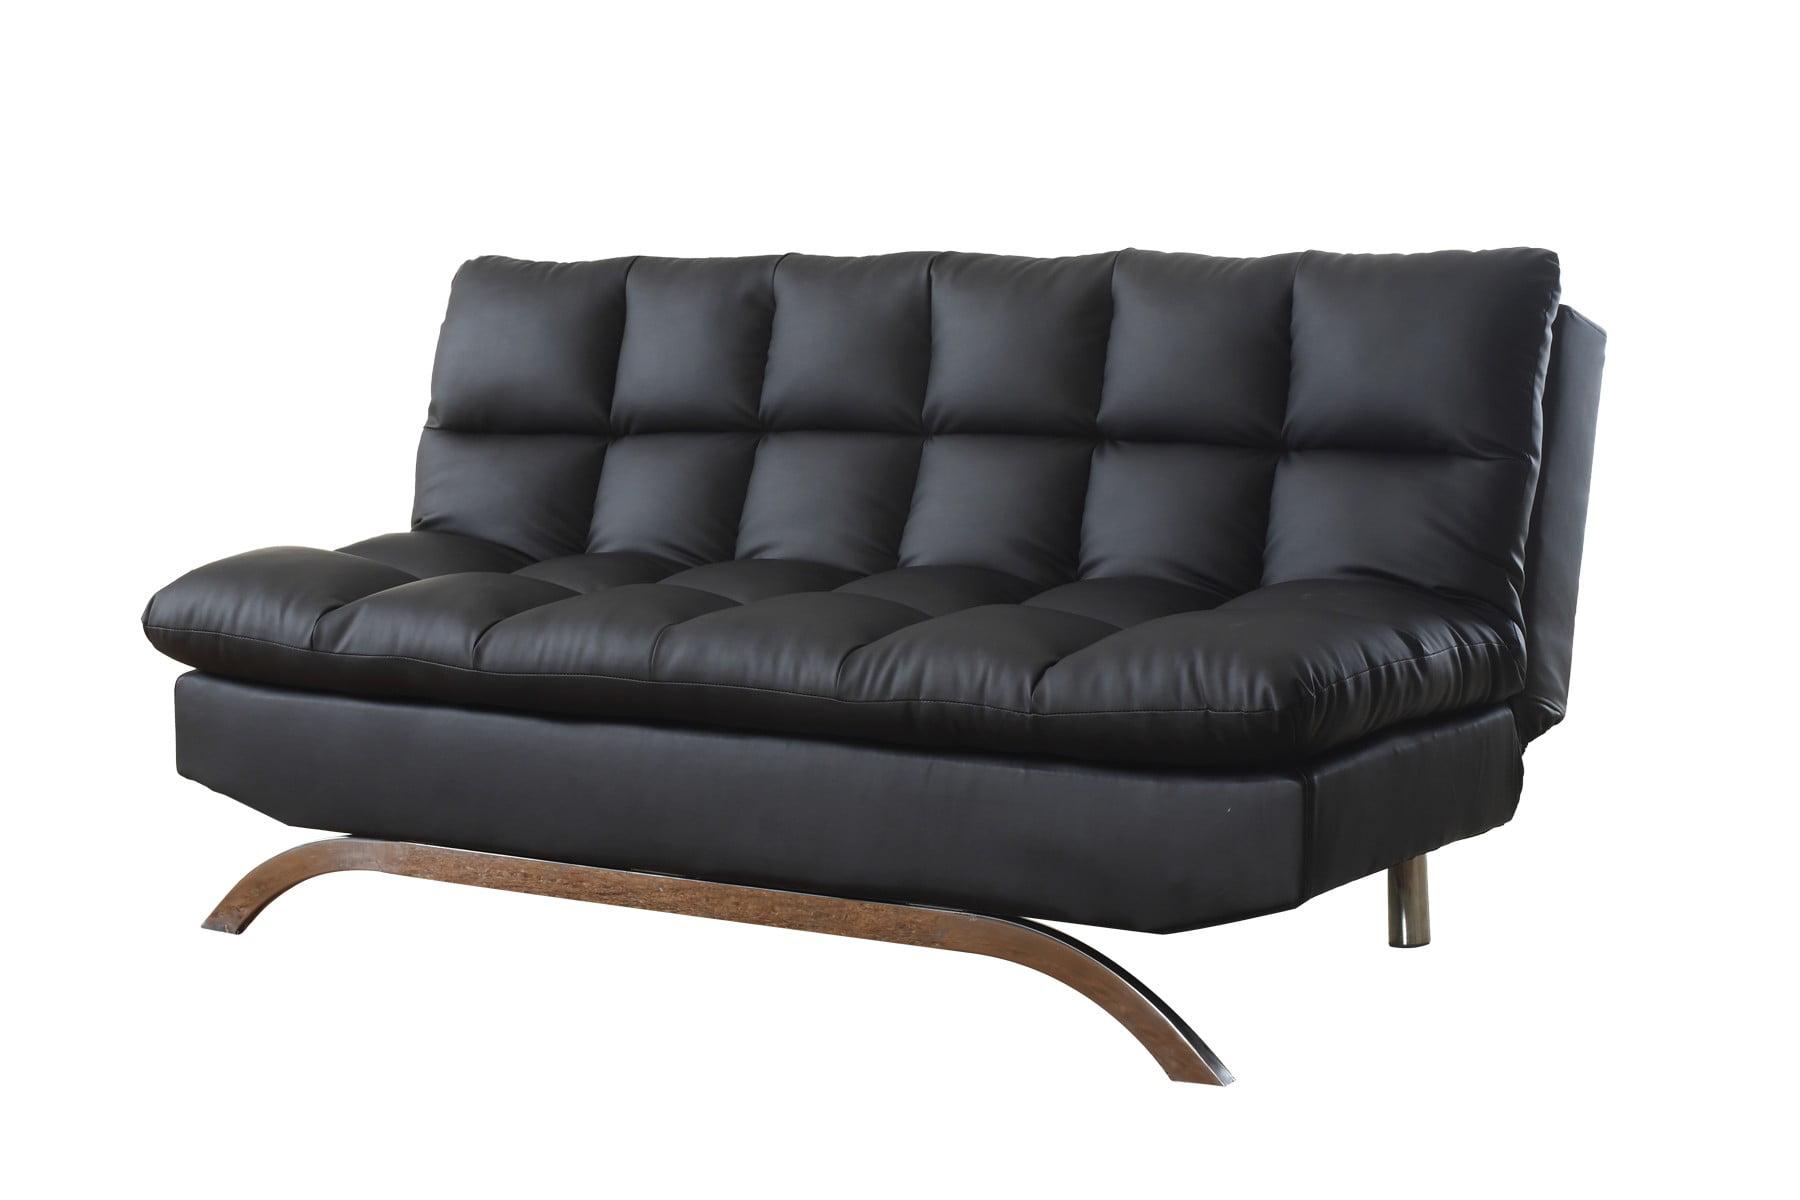 Plush Futon Sofa Bed With Chrome Legs Black   Walmart.com ...